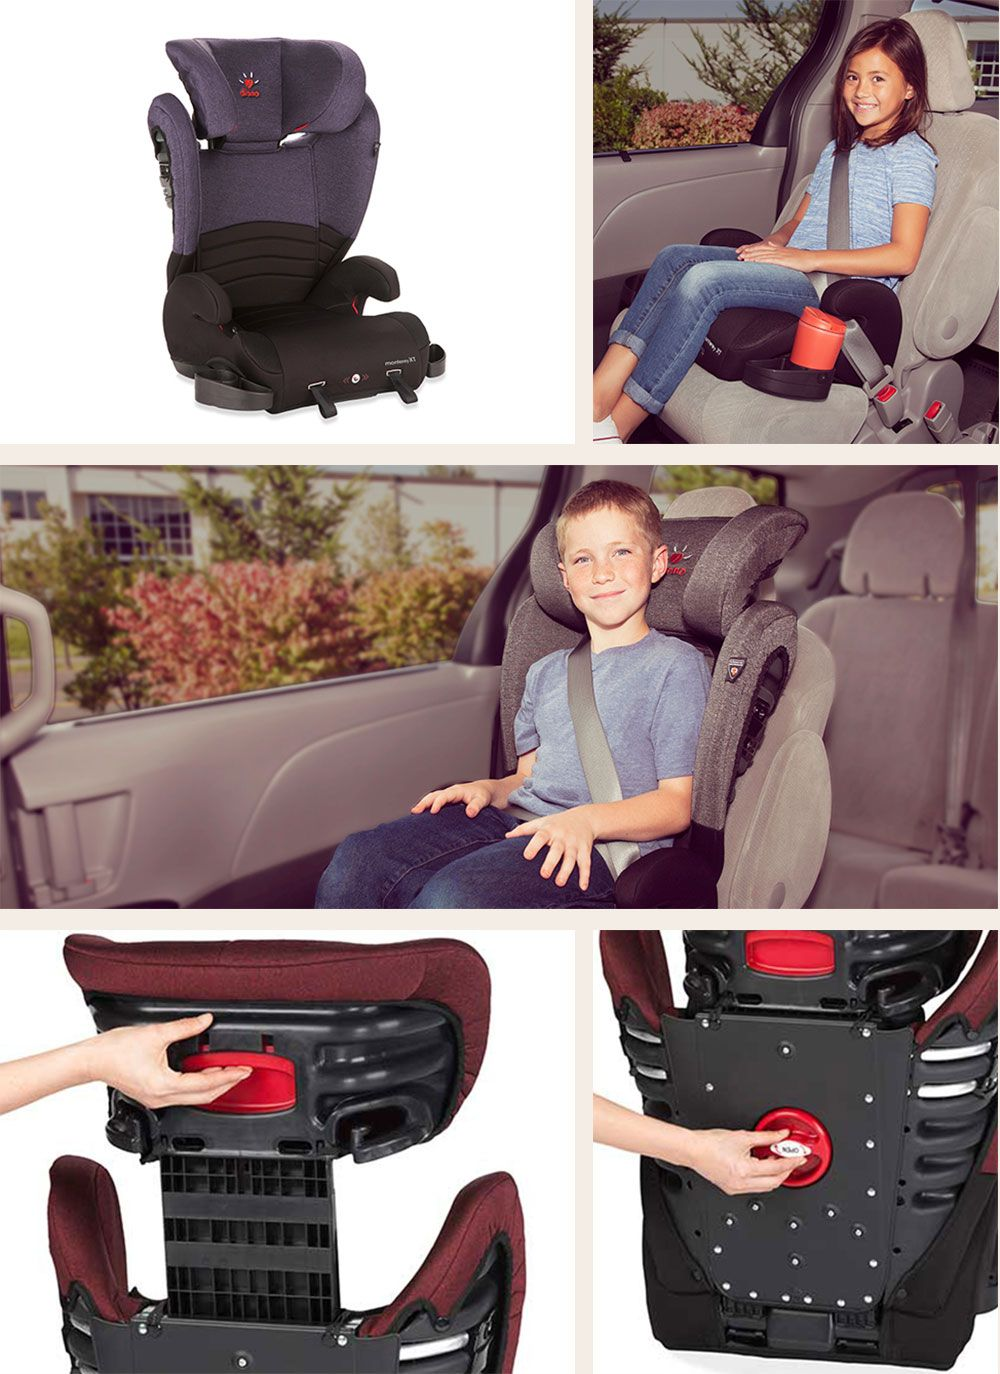 Monterey Xt Baby Car Seats Children 2 In